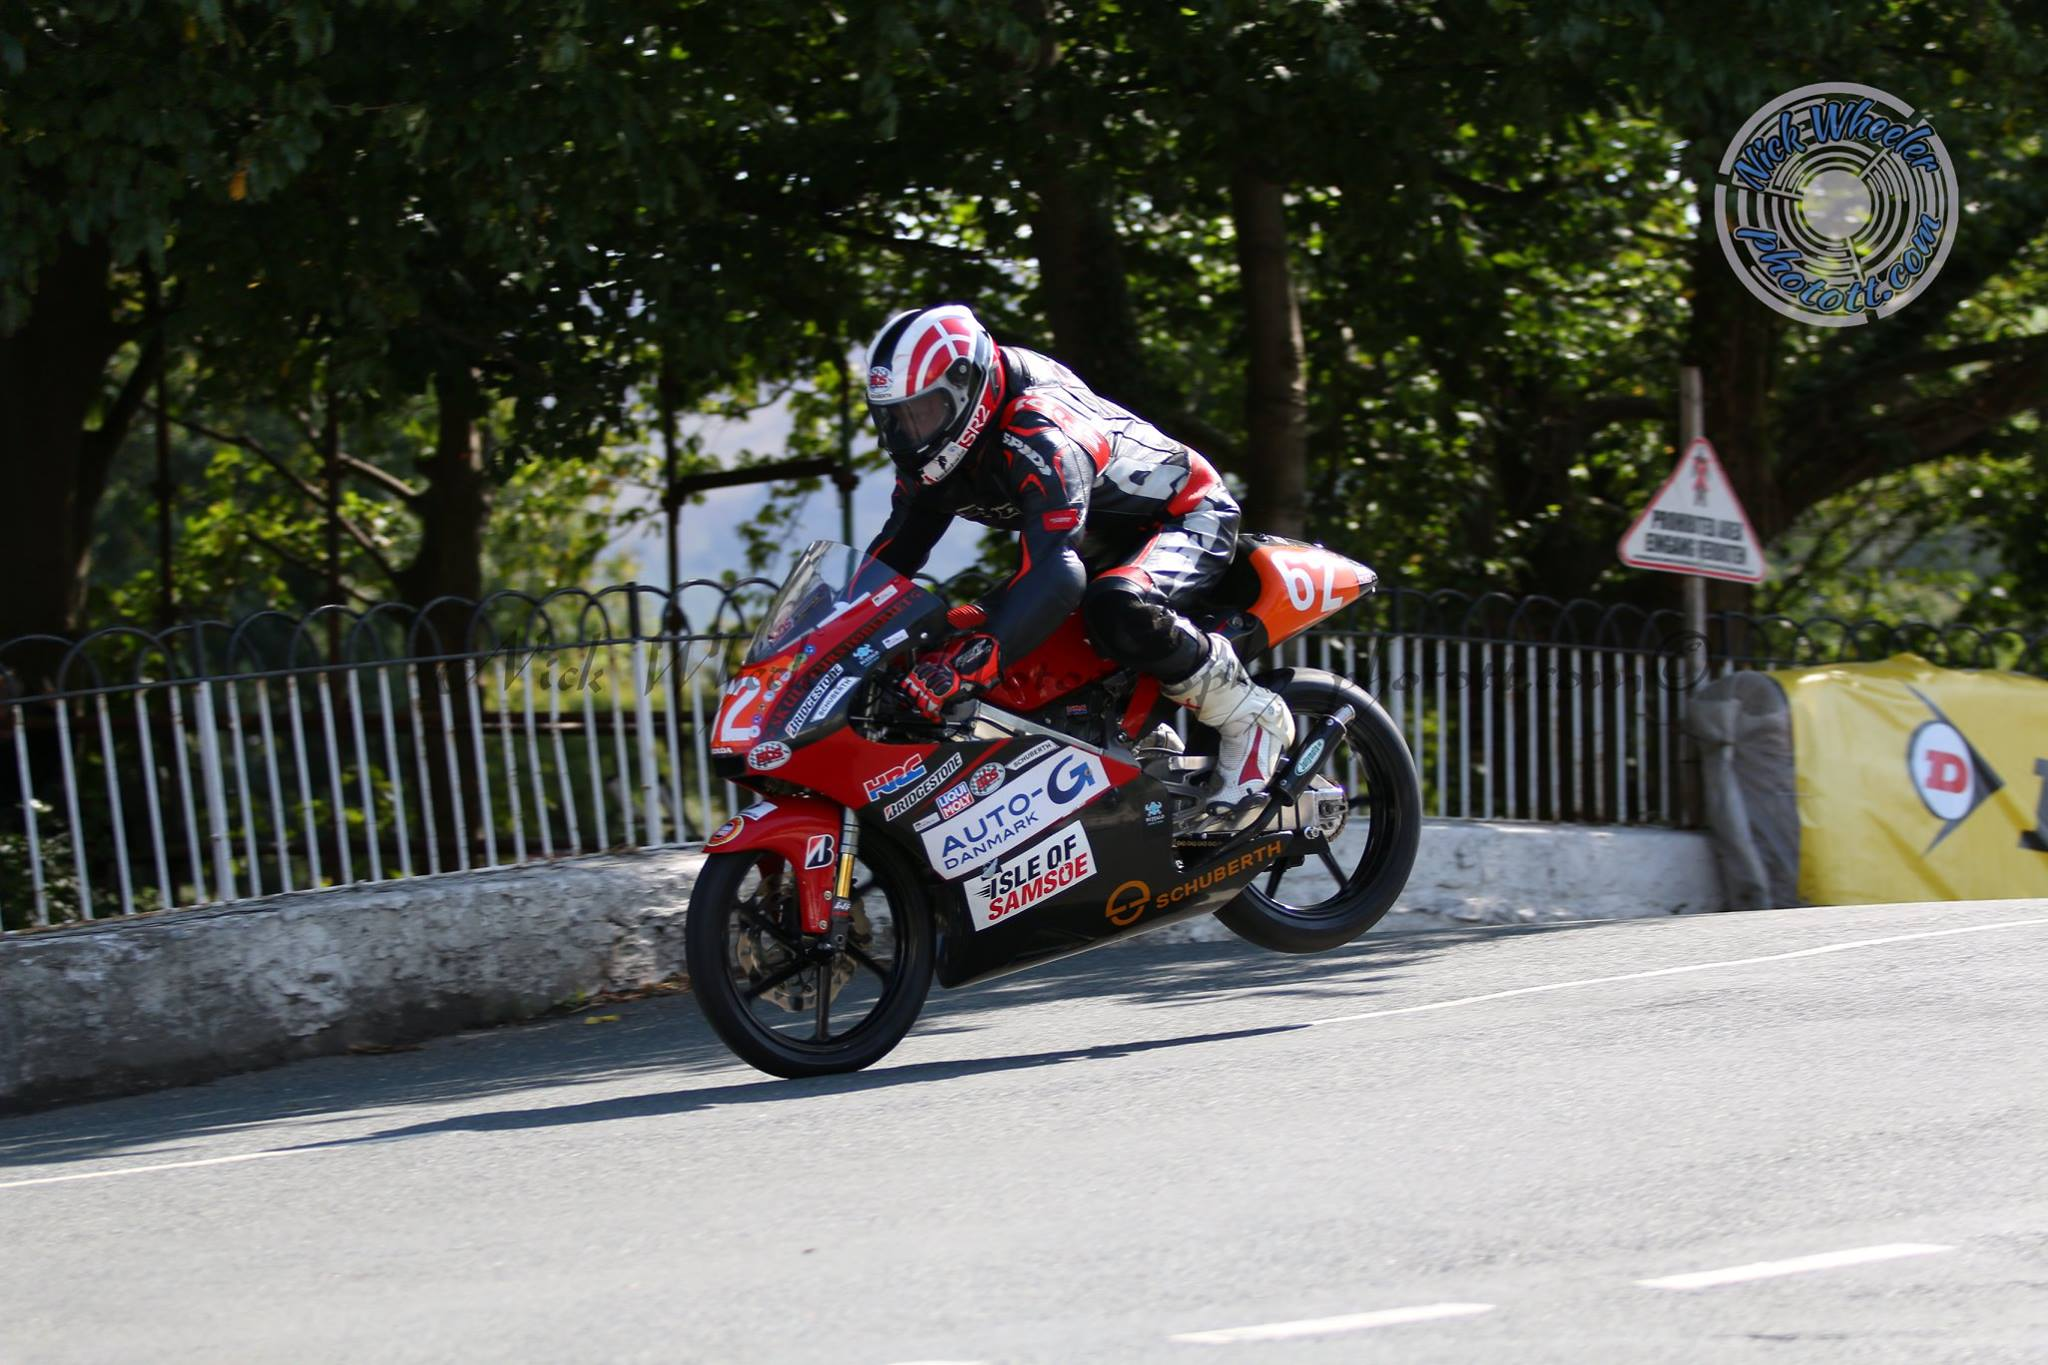 Manx GP Top 6: Carsten Svendsen